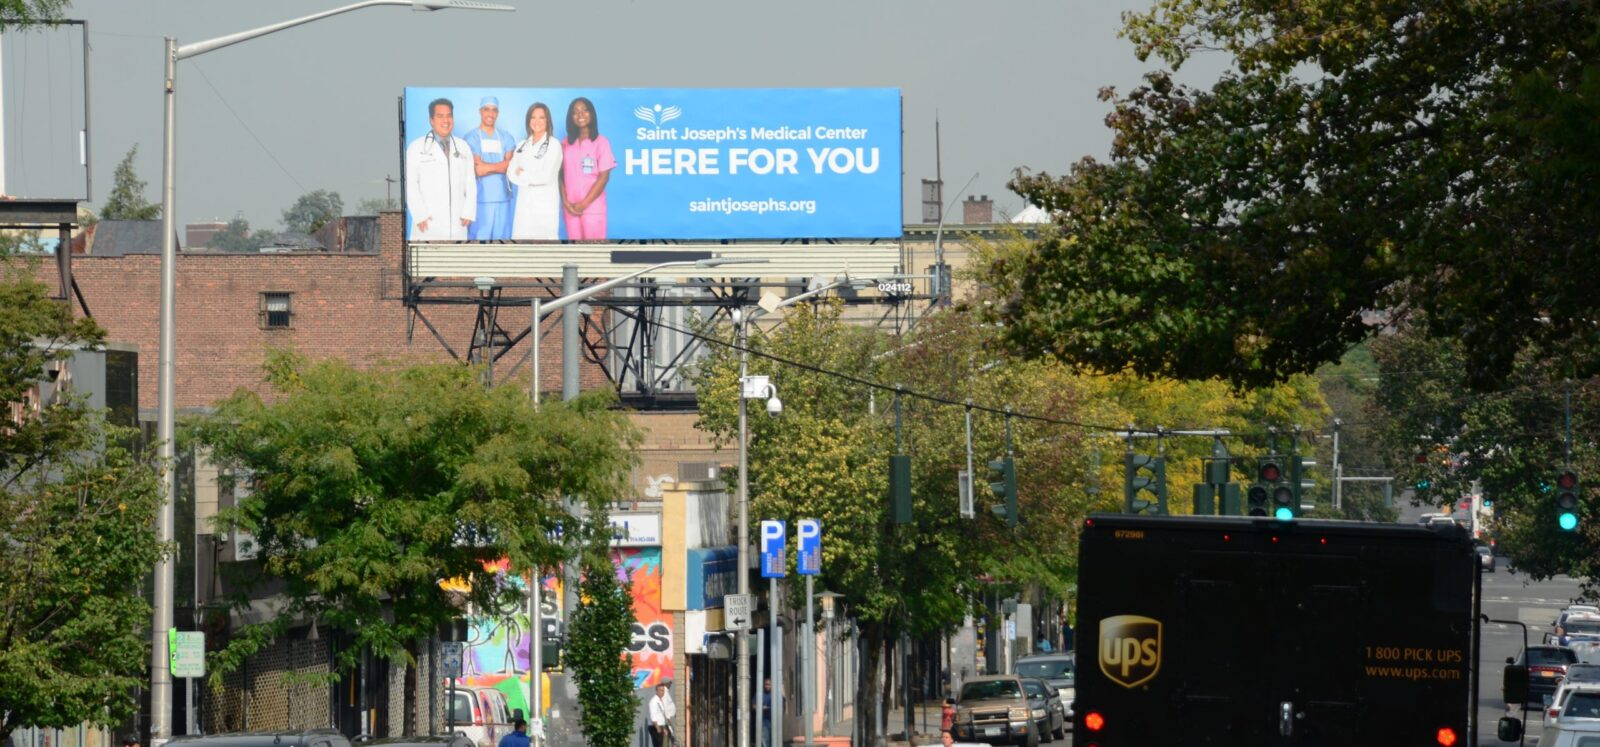 St Josephs Healthcare Billboard Advertising